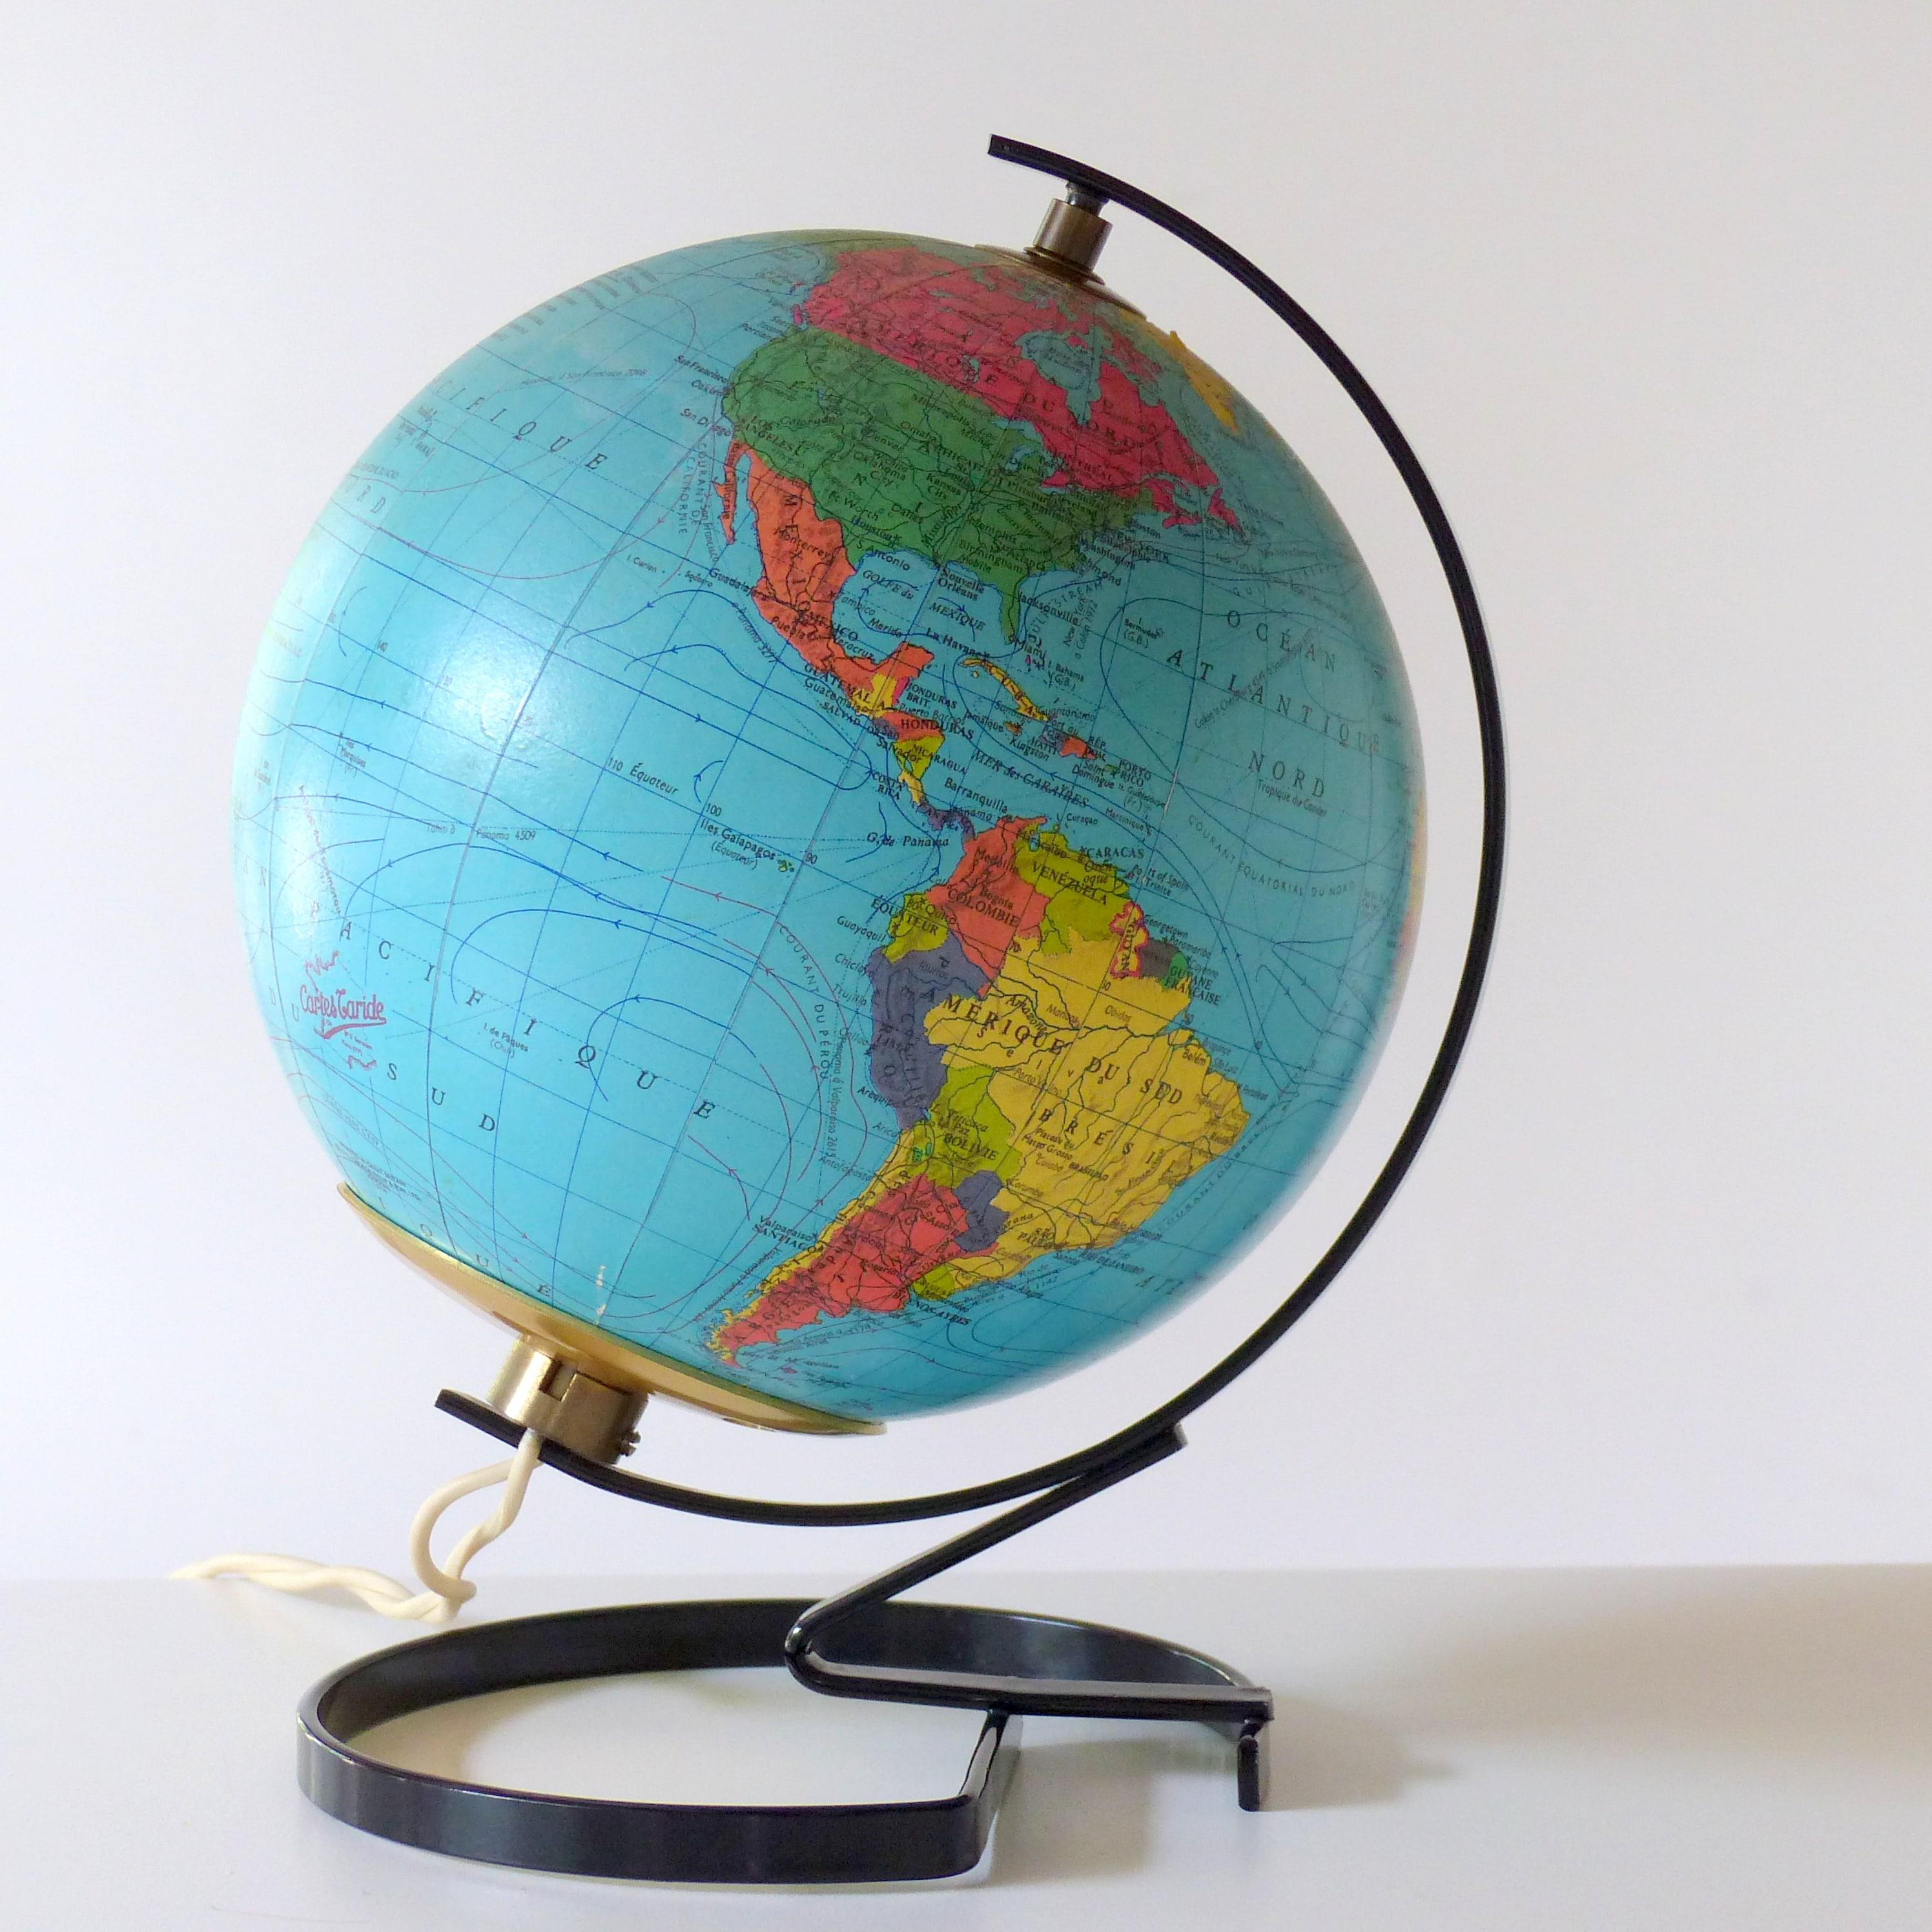 petit globe terrestre lumineux taride lignedebrocante. Black Bedroom Furniture Sets. Home Design Ideas